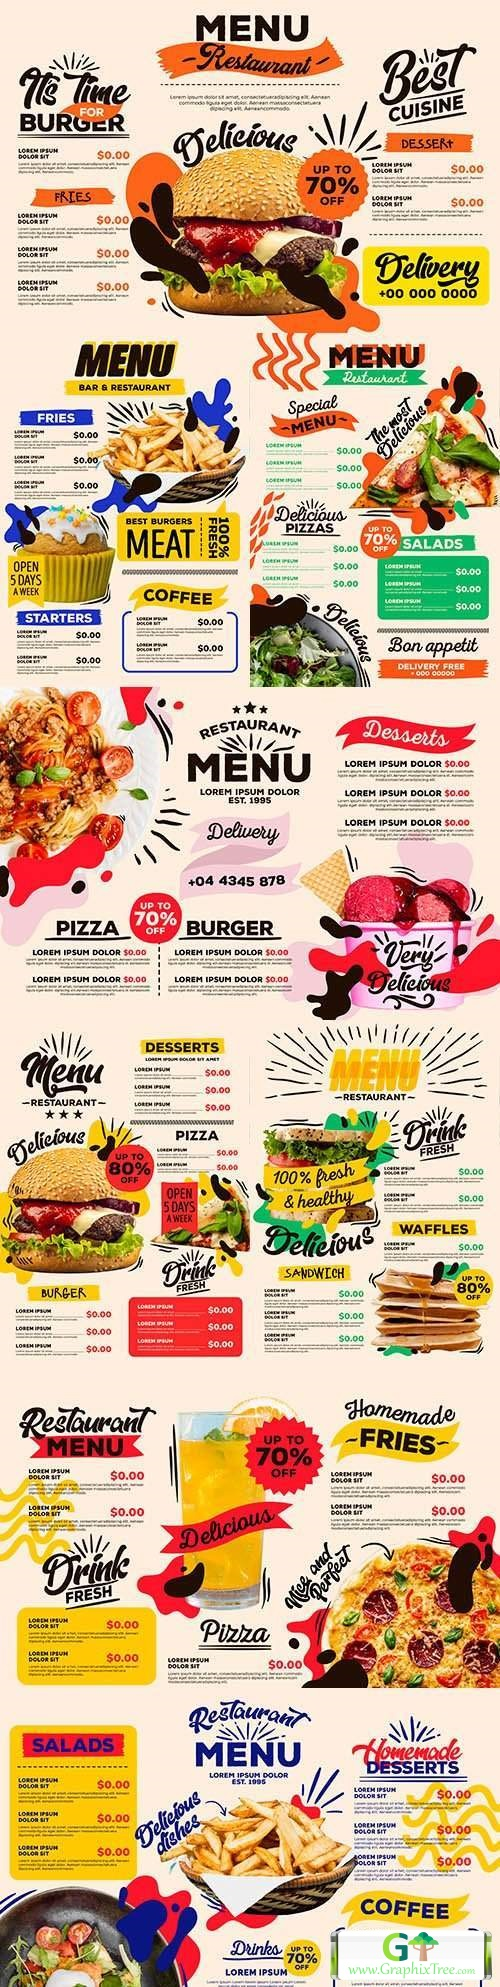 Menu modern restaurant design collection template